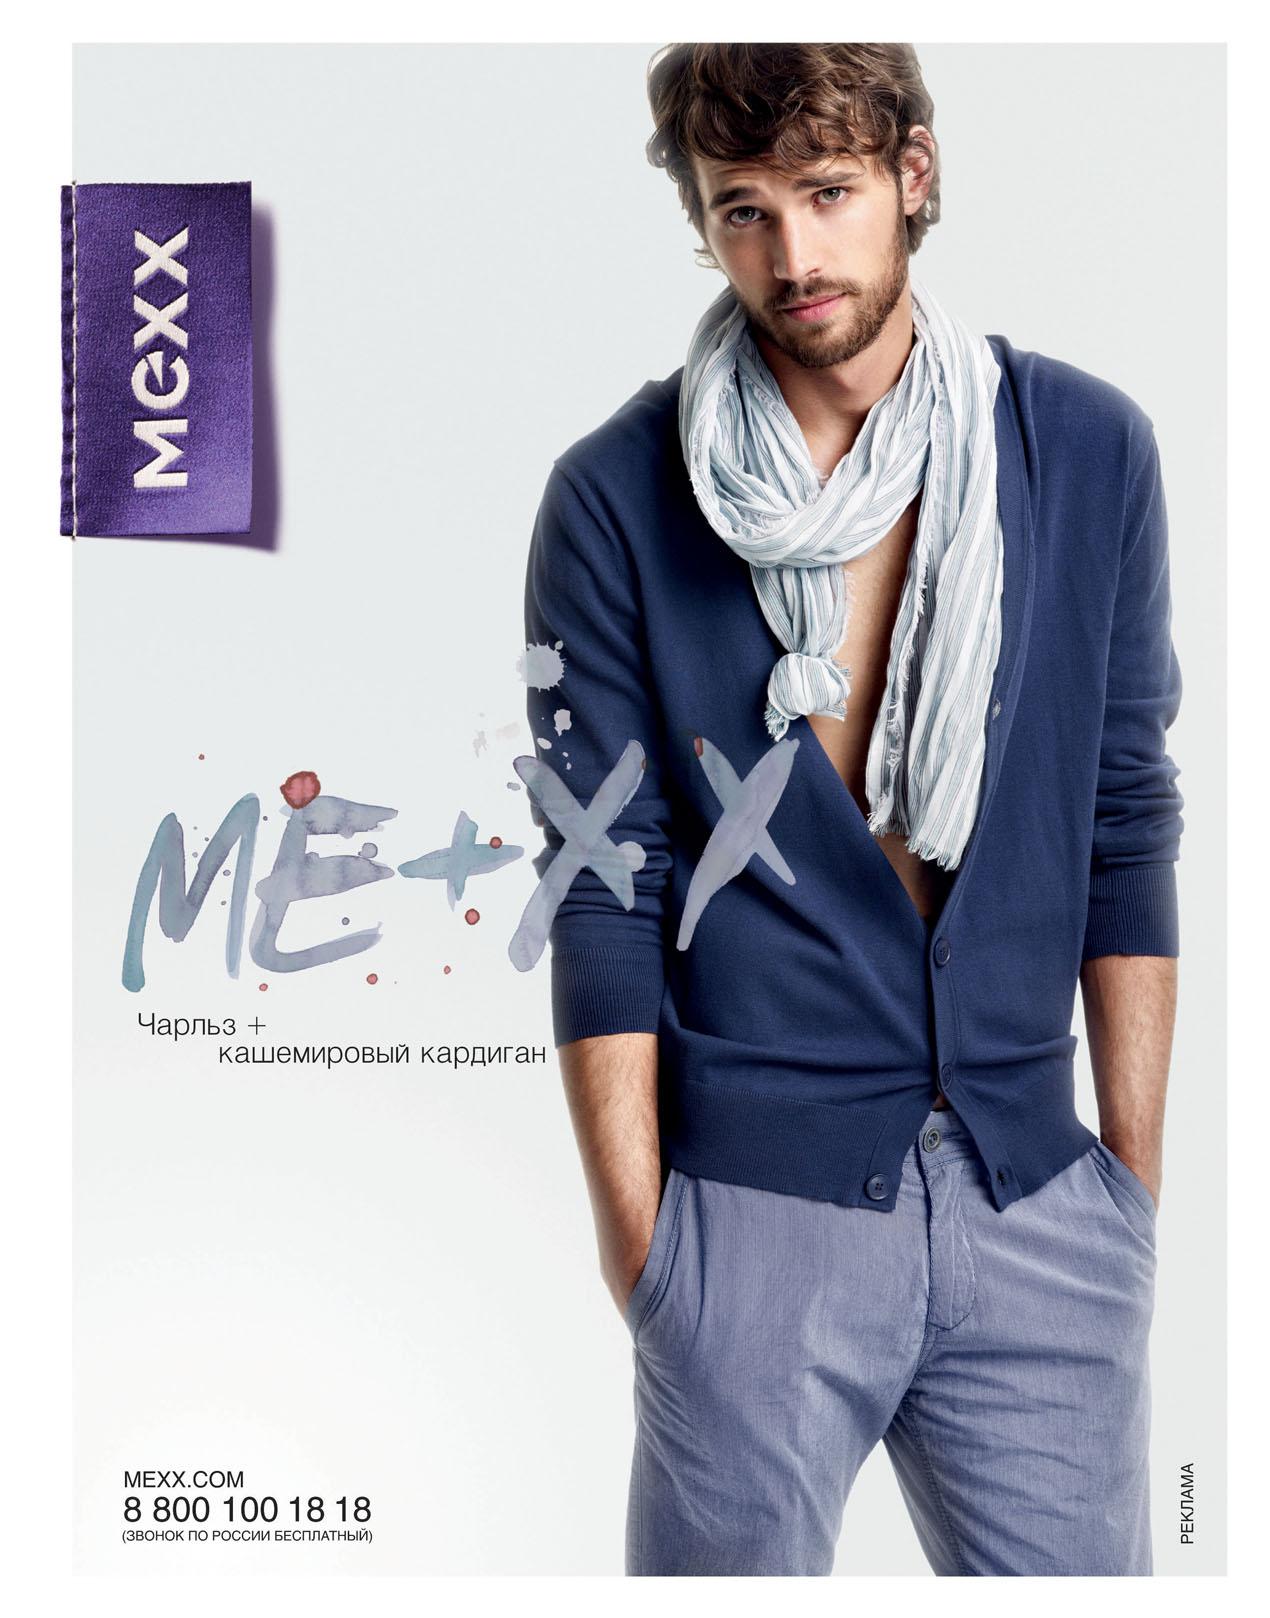 Одежда Мехх